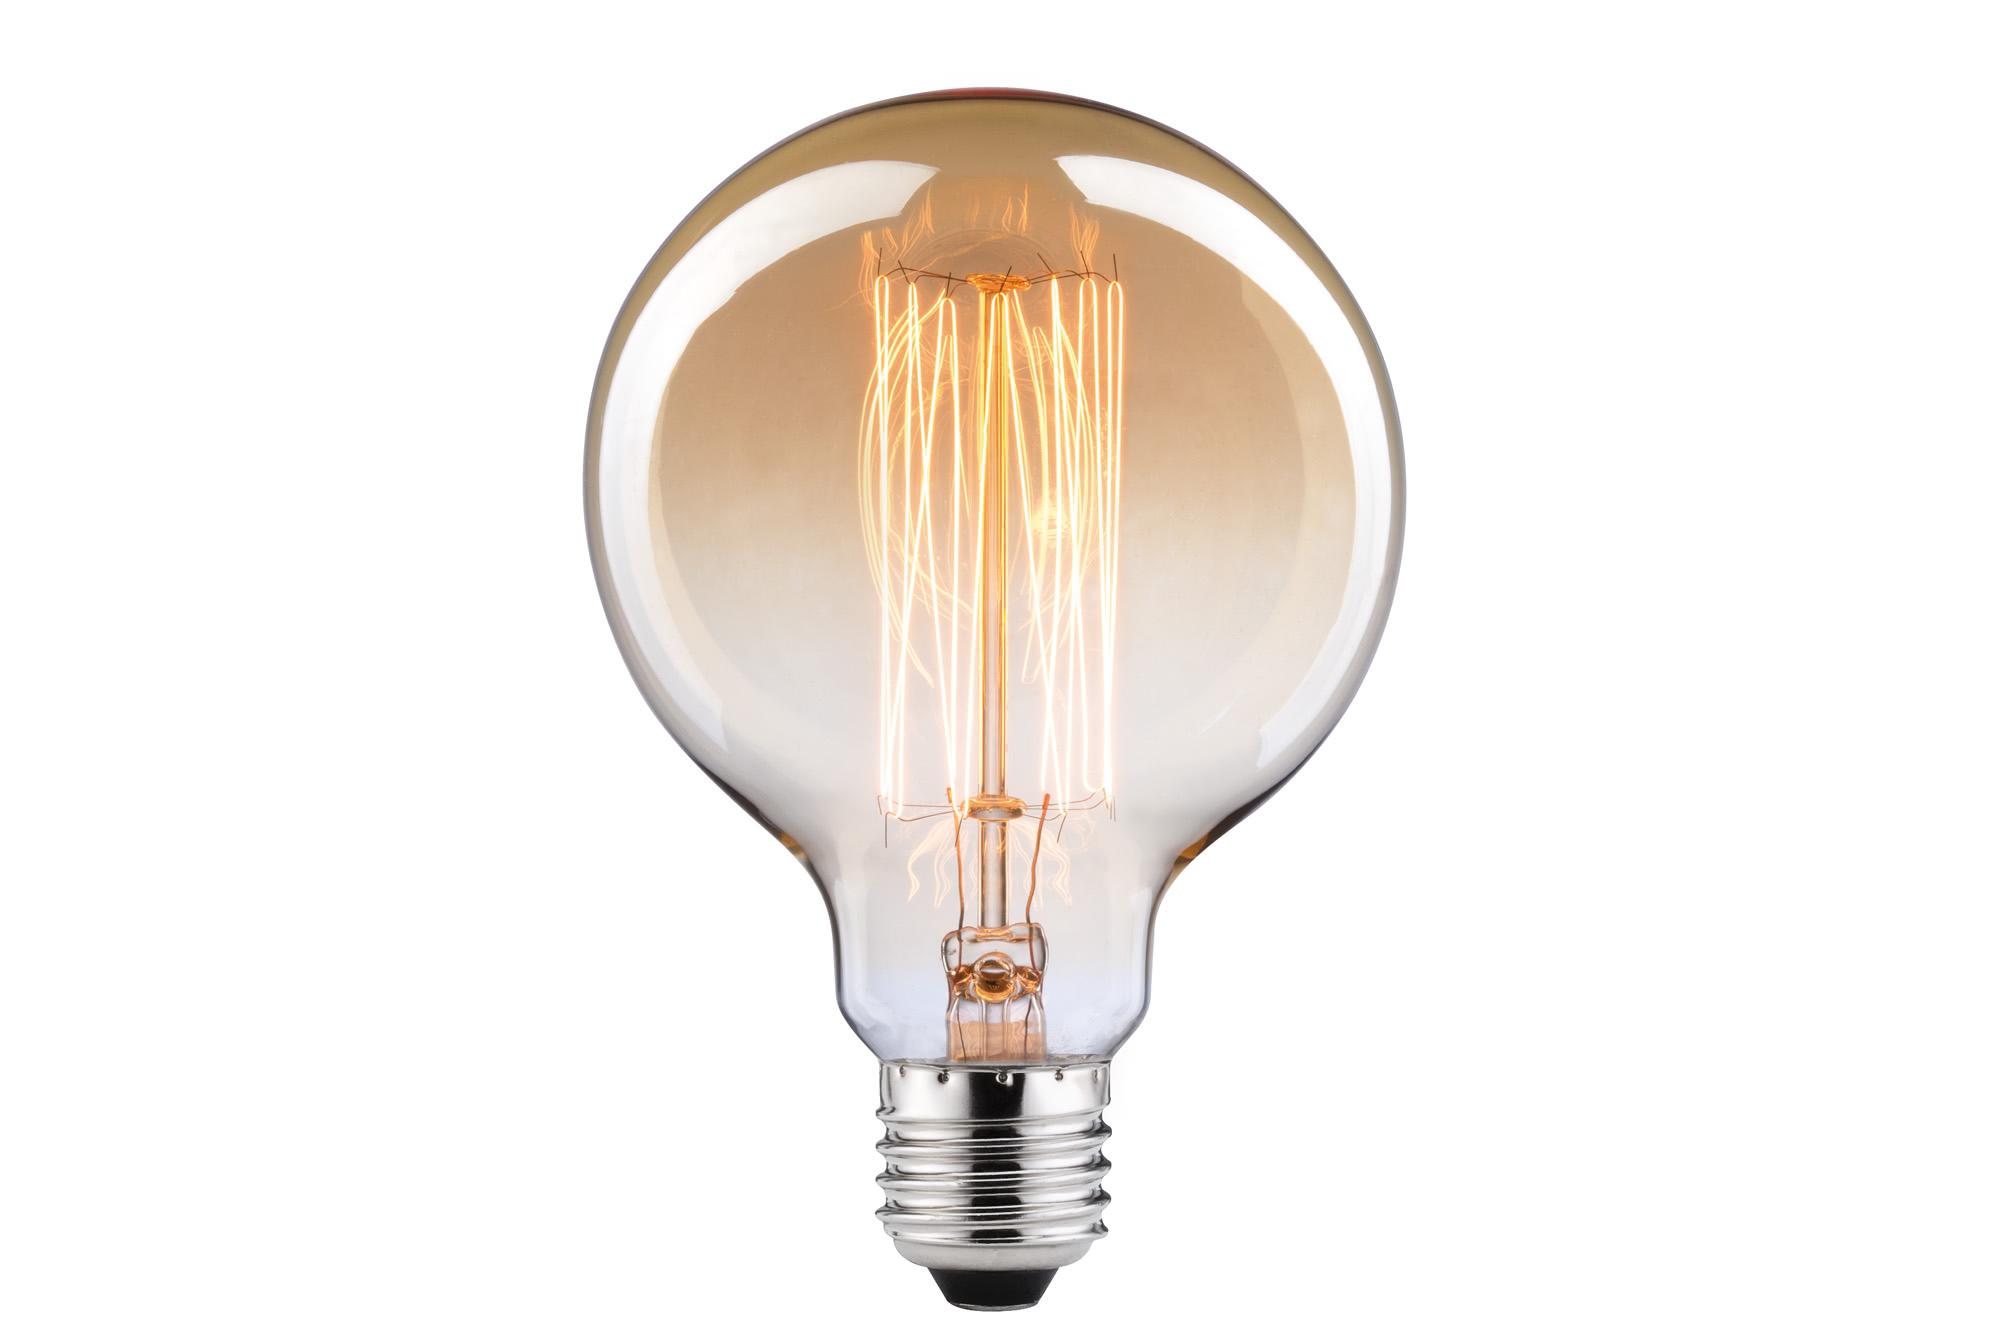 Paulmann. 54025 Лампа Globe 95 Rustika 40W E27 230V, золото